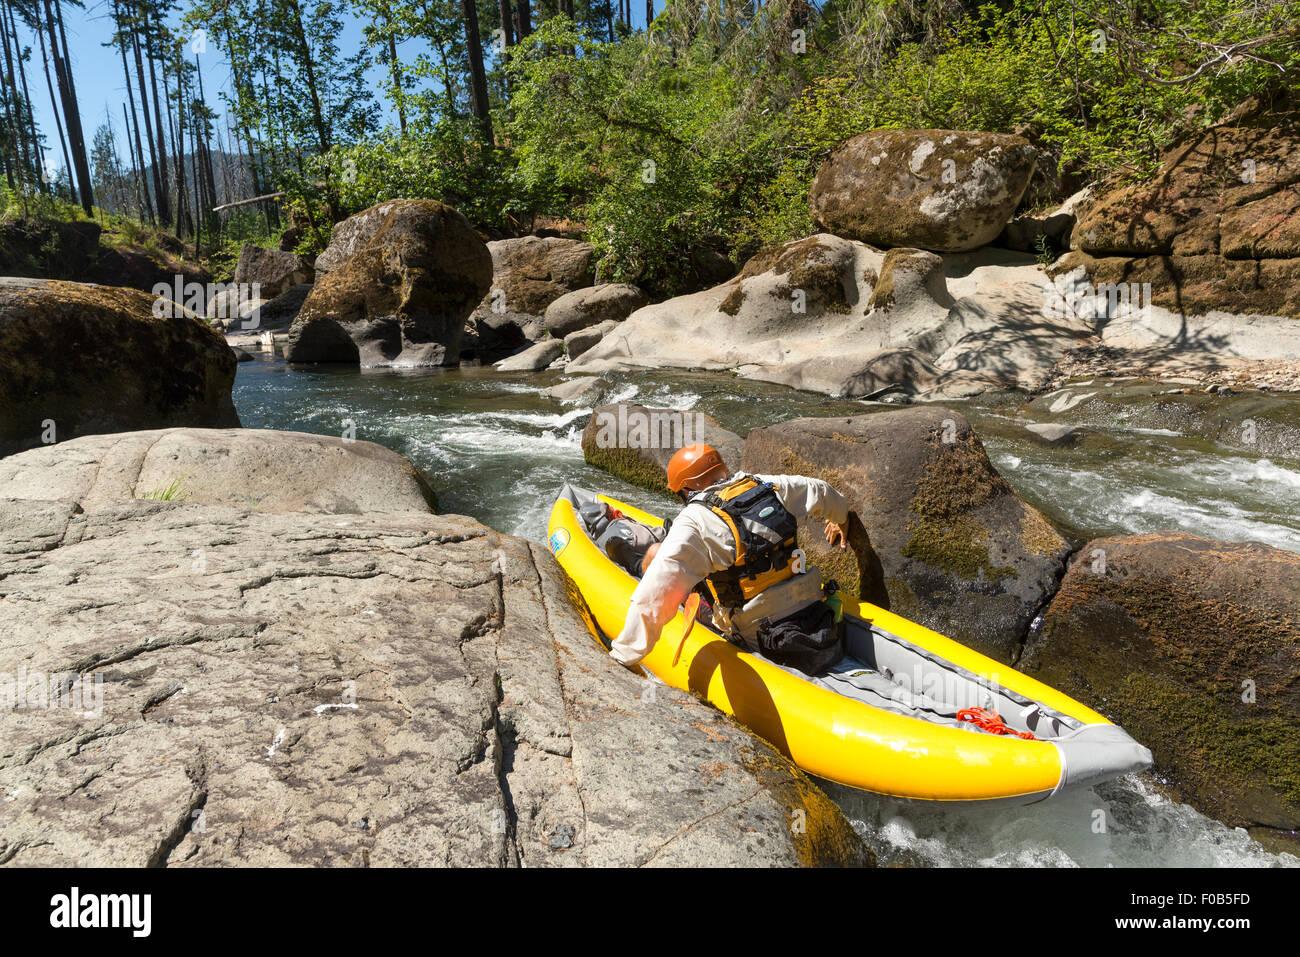 Paddler pushing wedged boat through a narrow shoot on Fall Creek, Oregon. - Stock Image